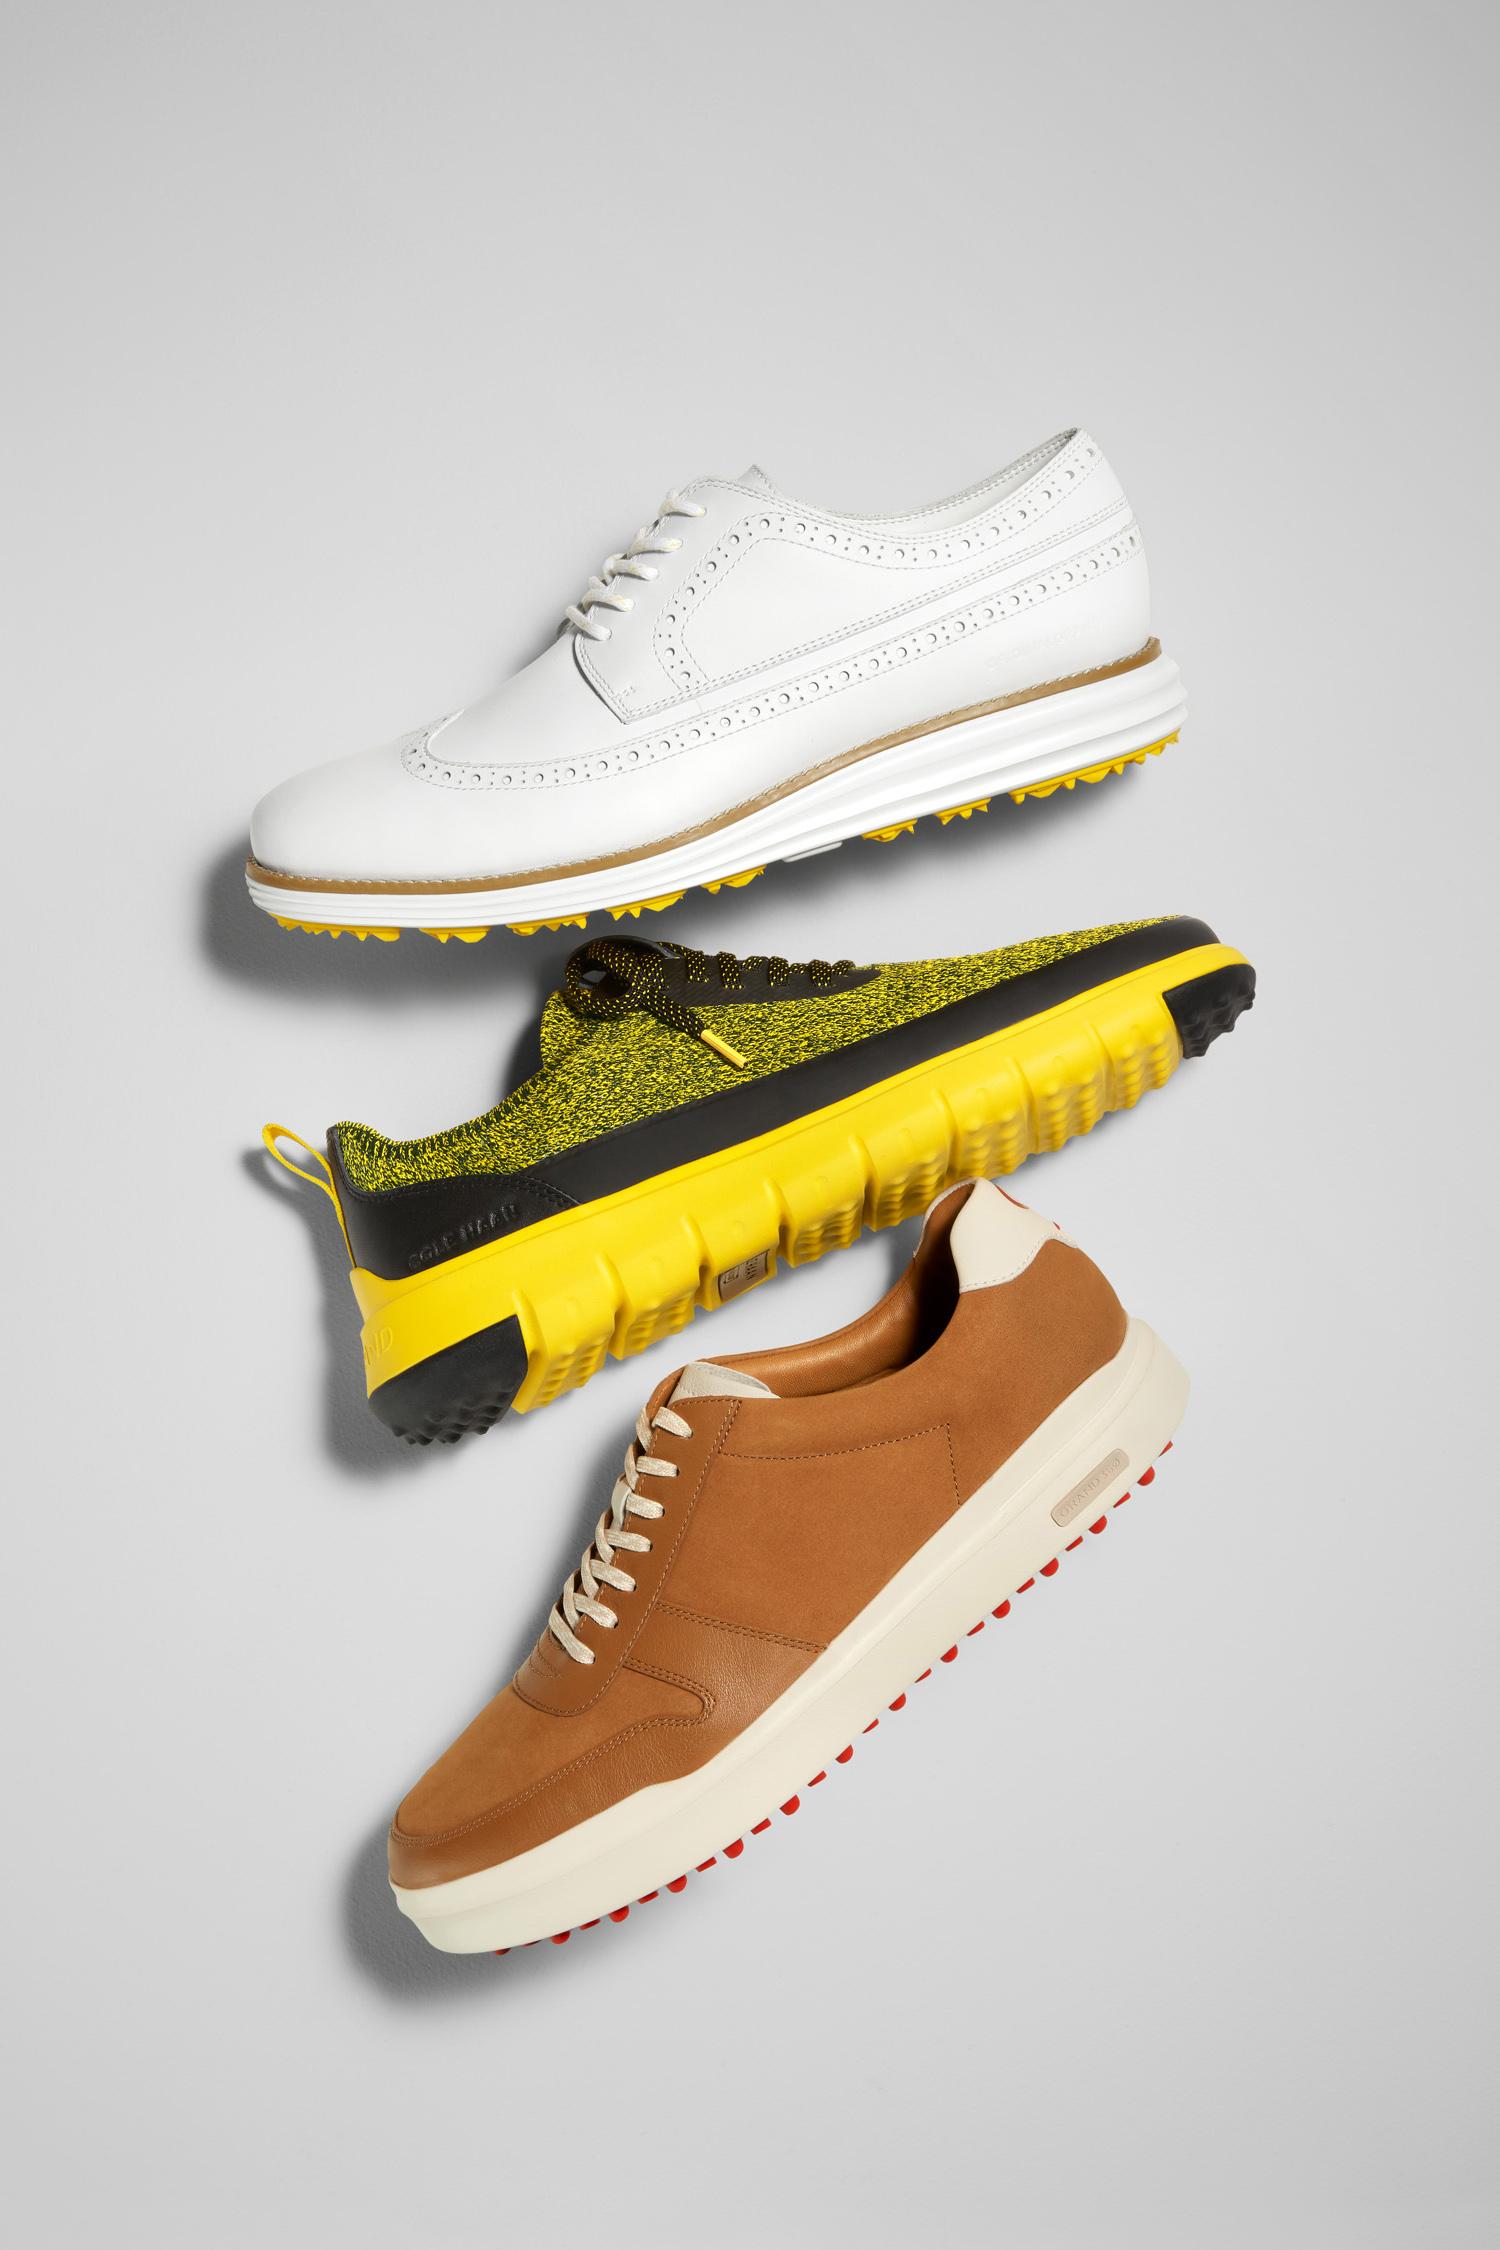 Cole Haan Men's Golf Shoes